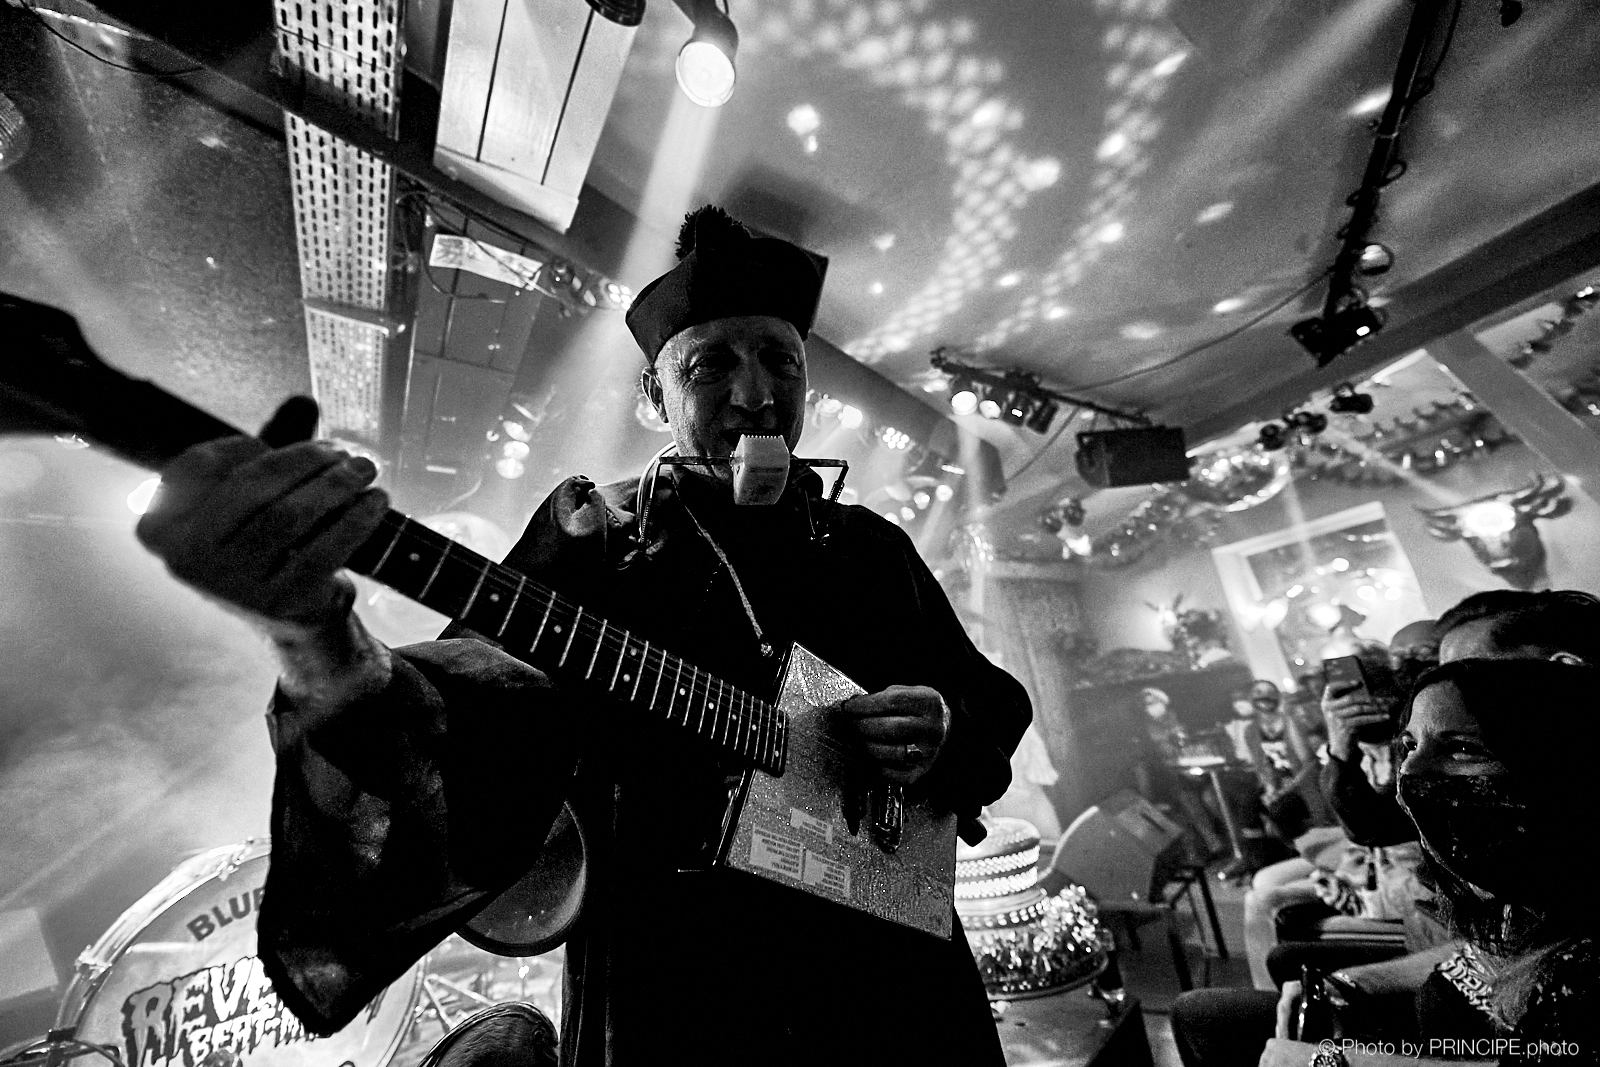 Reverend Beat-Man @ Café Bar Mokka